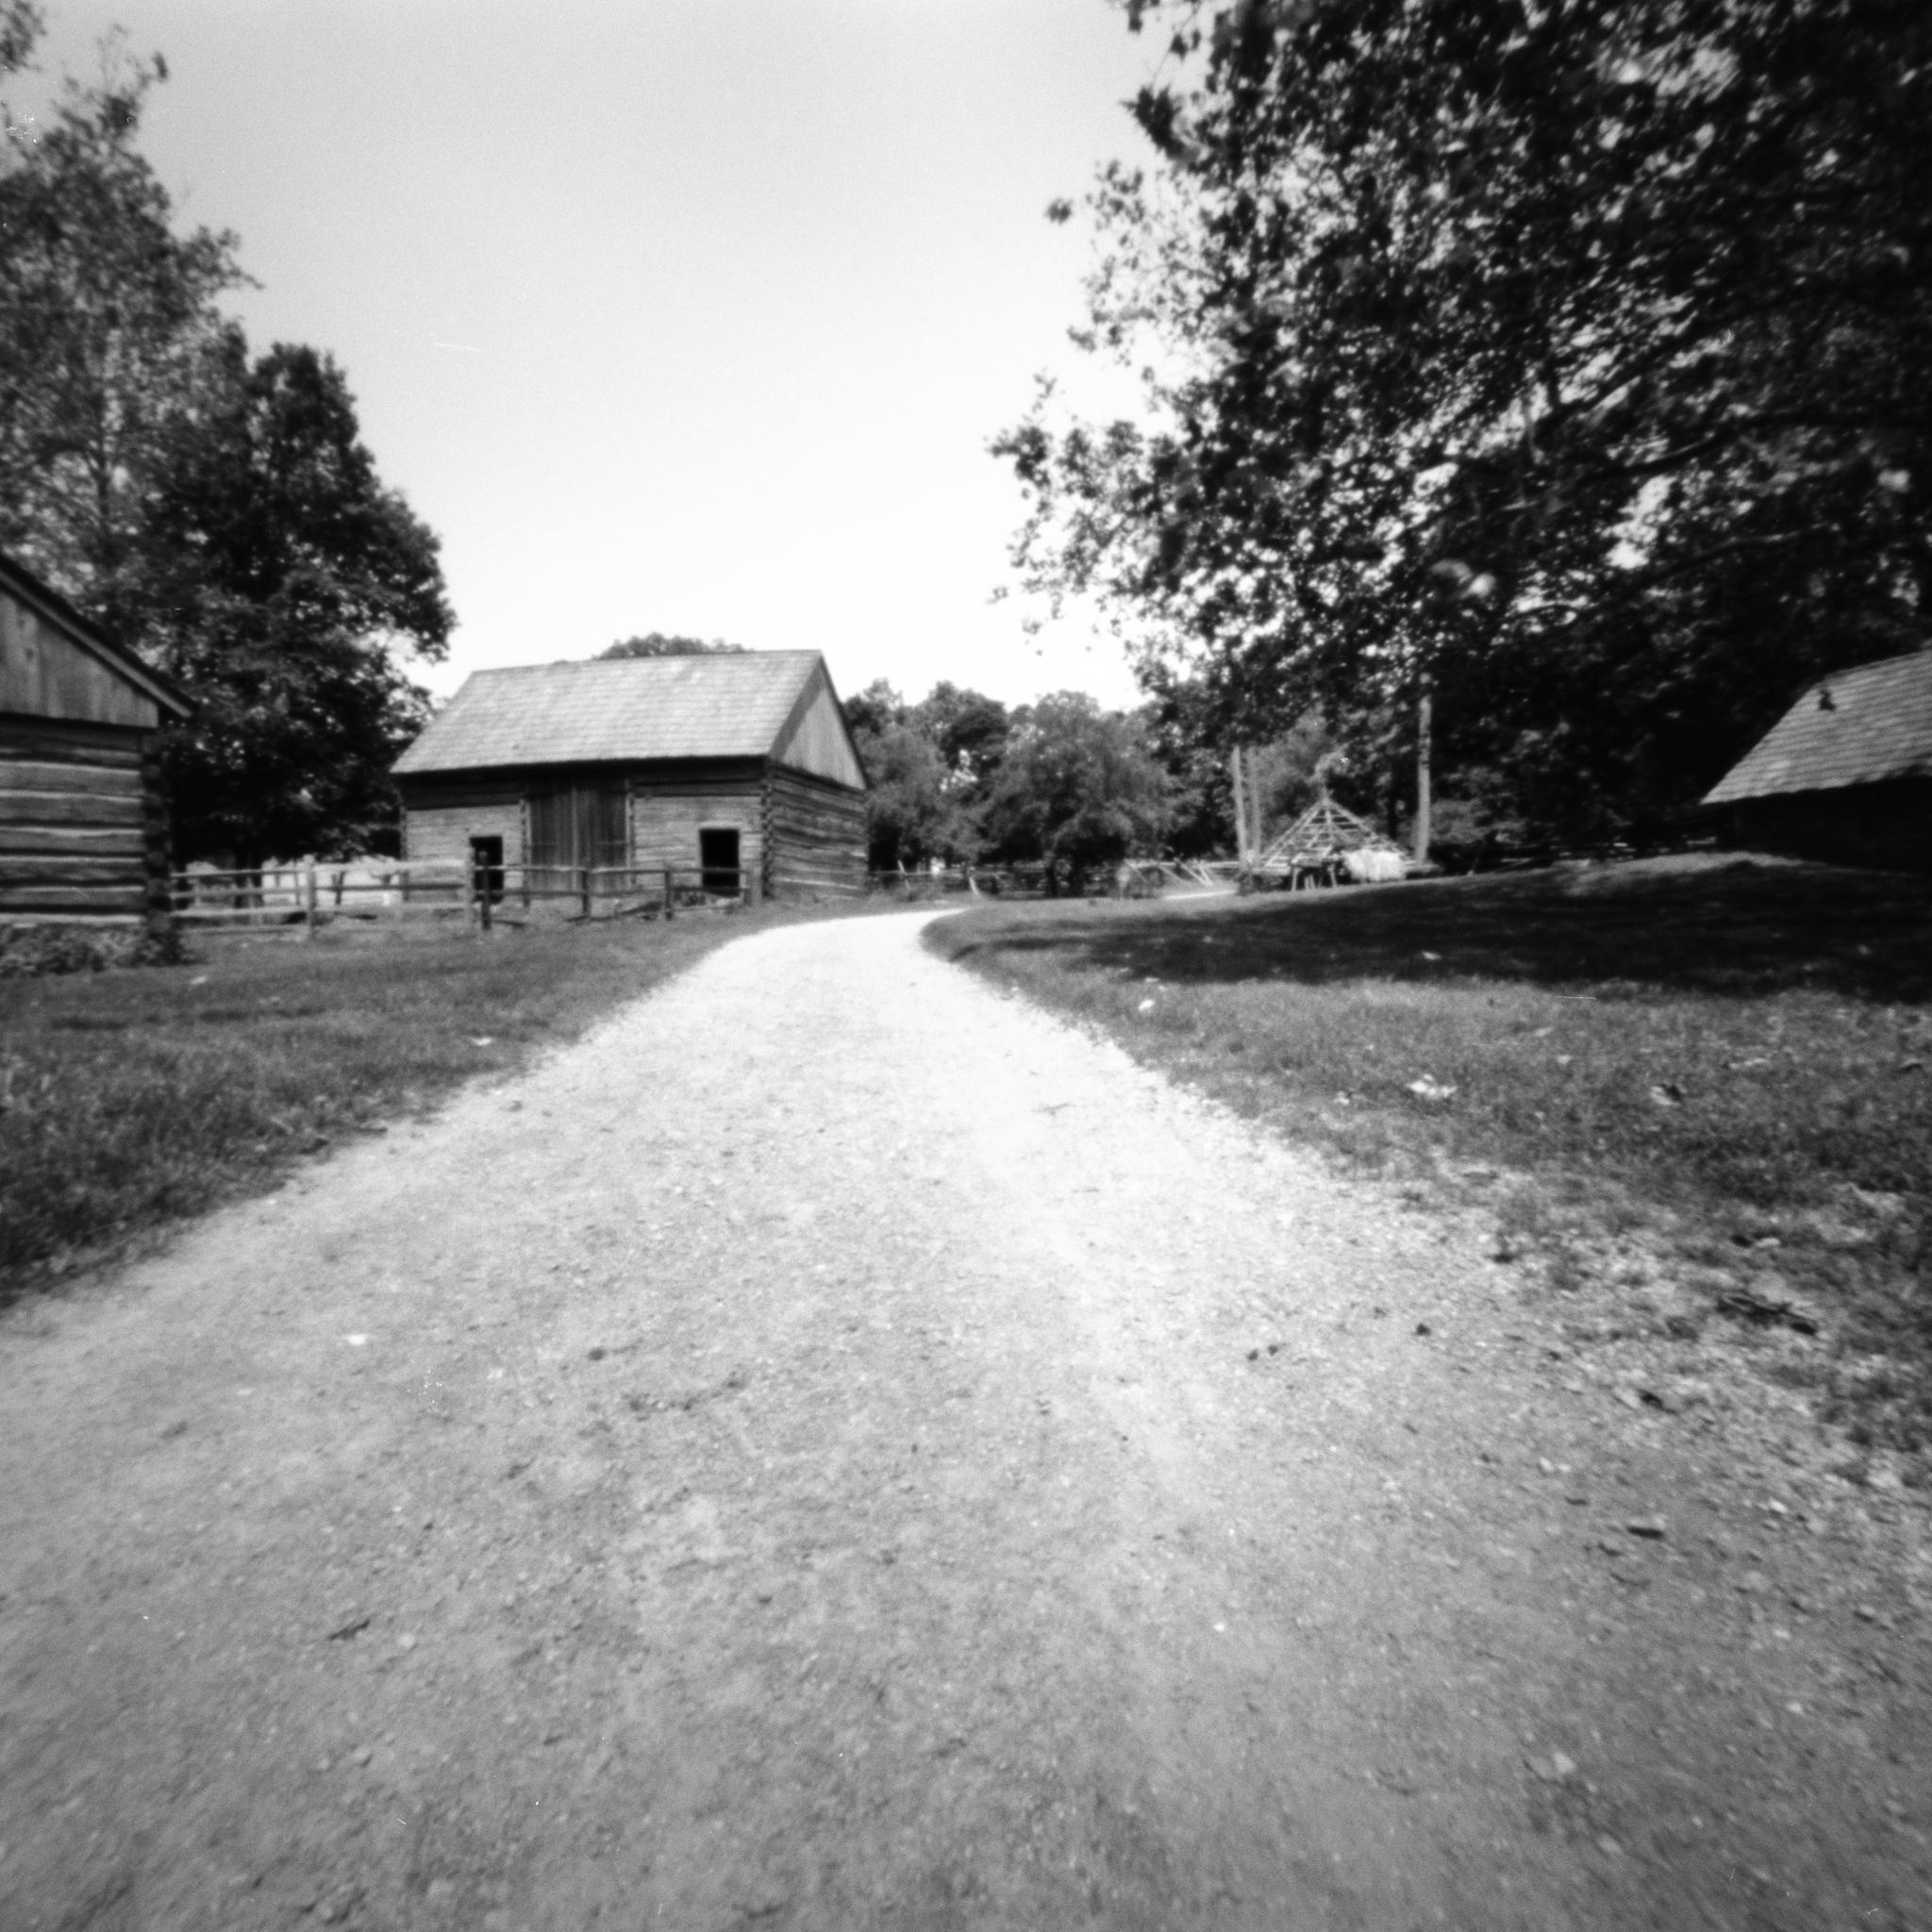 Landis Valley Farm Museum. Lancaster, Pennsylvania. Zero Image 2000 6x6.